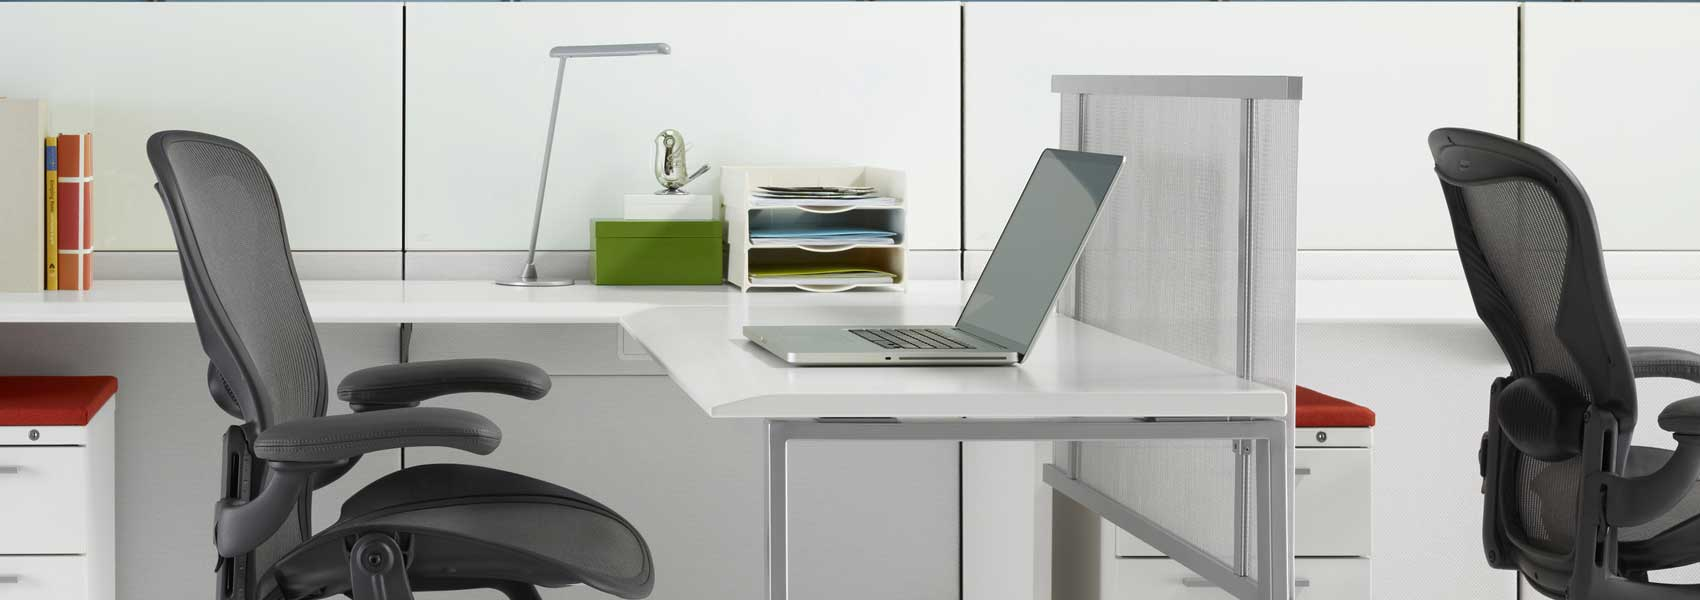 interior design for office furniture. Modular Office Desk Interior Design For Furniture